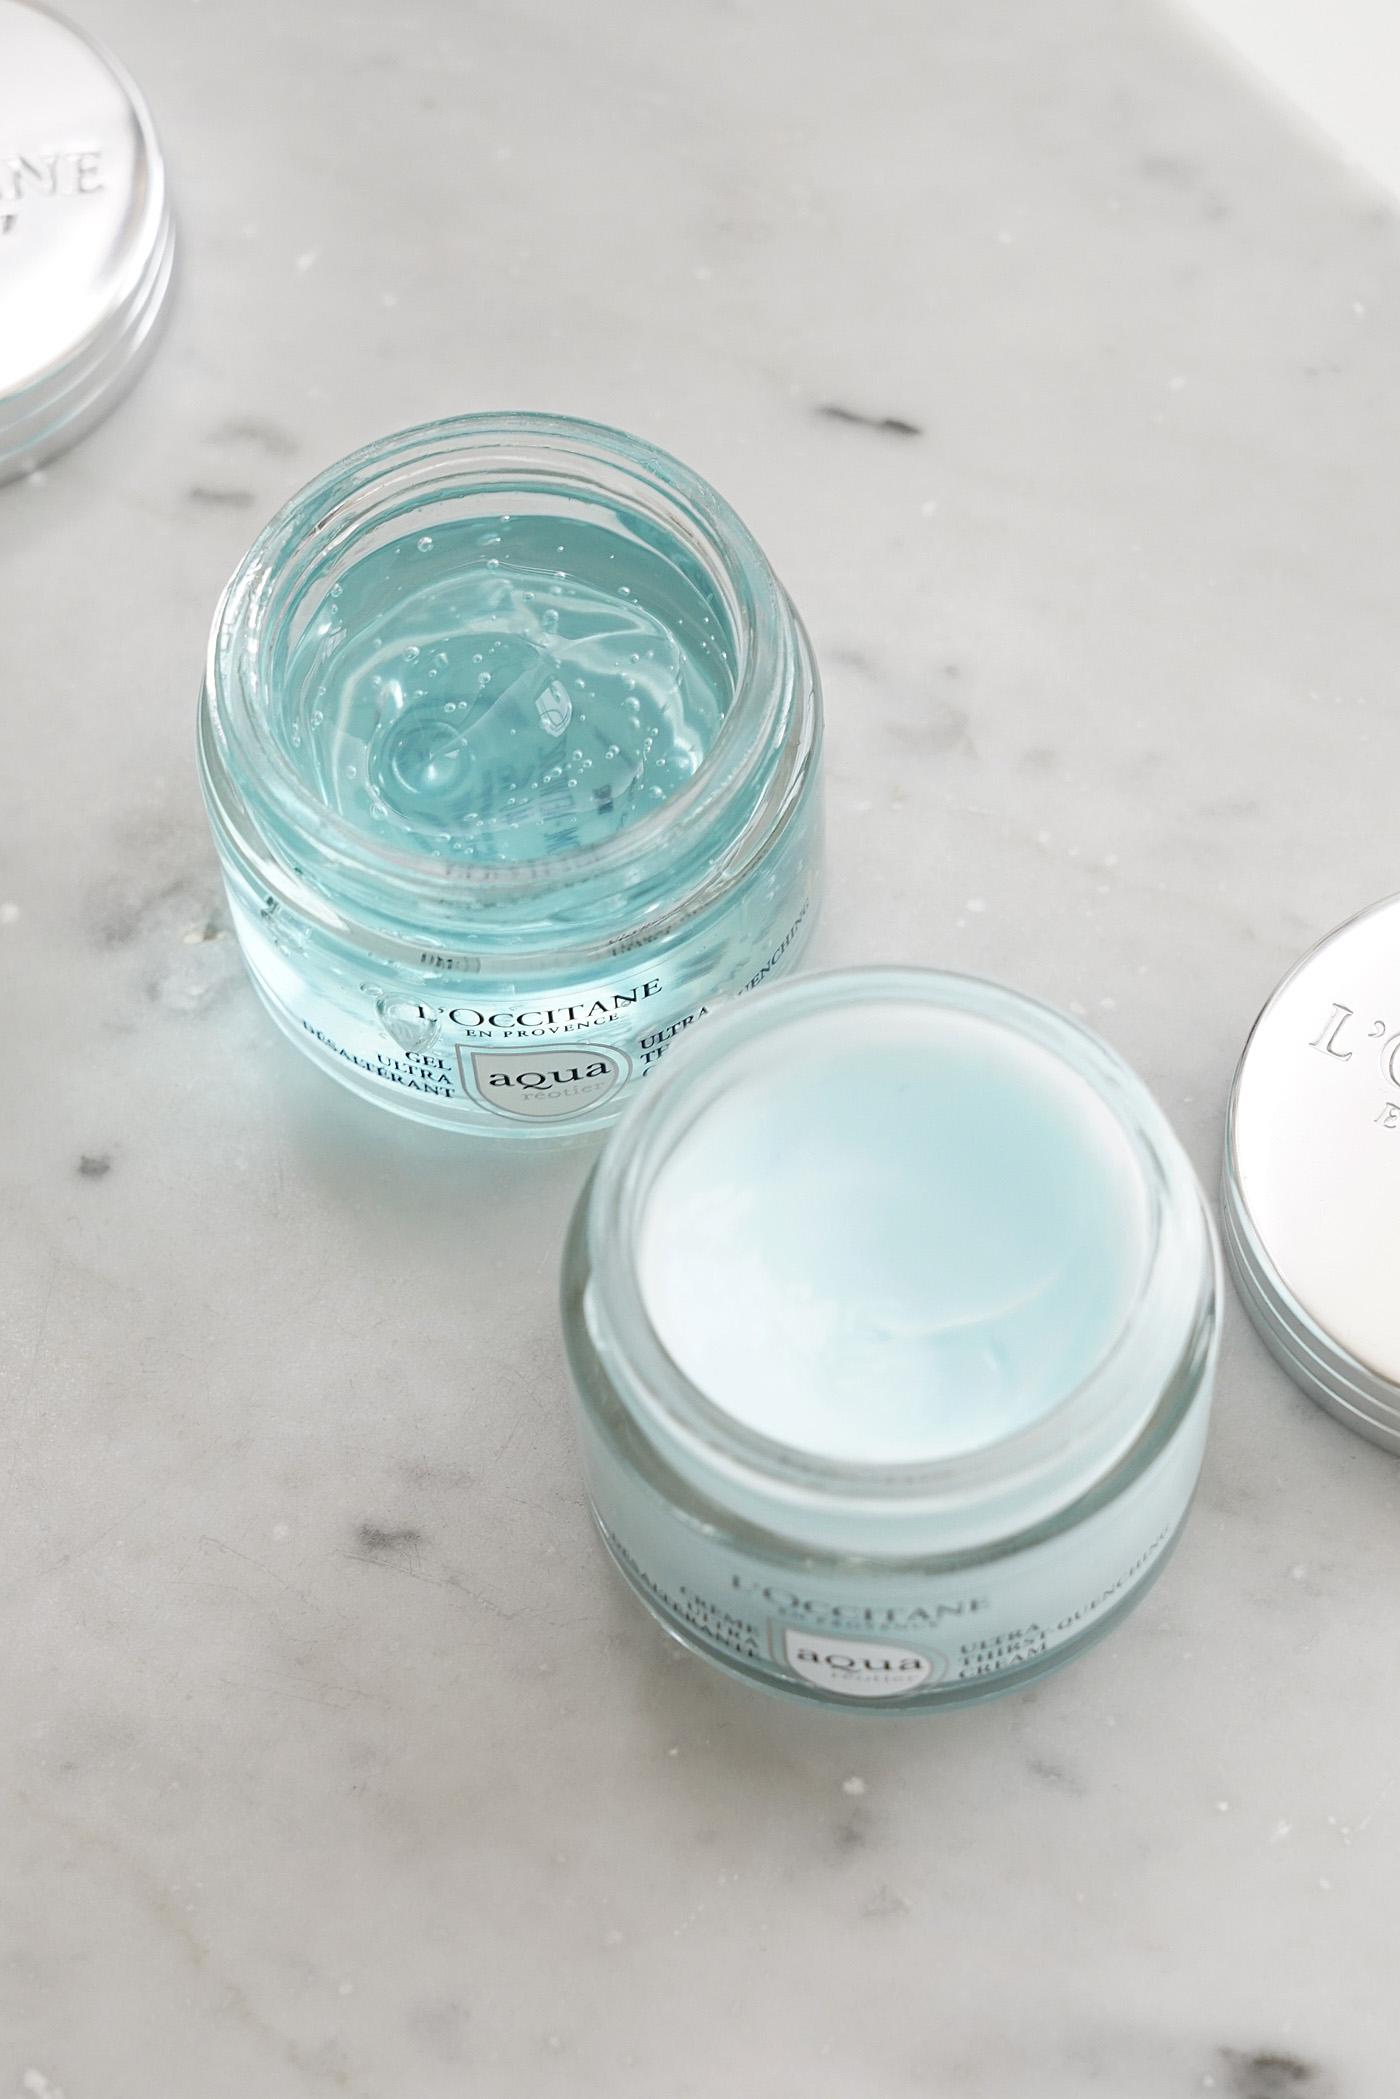 Aqua Reotier Thirst-Quenching Gel vs crème